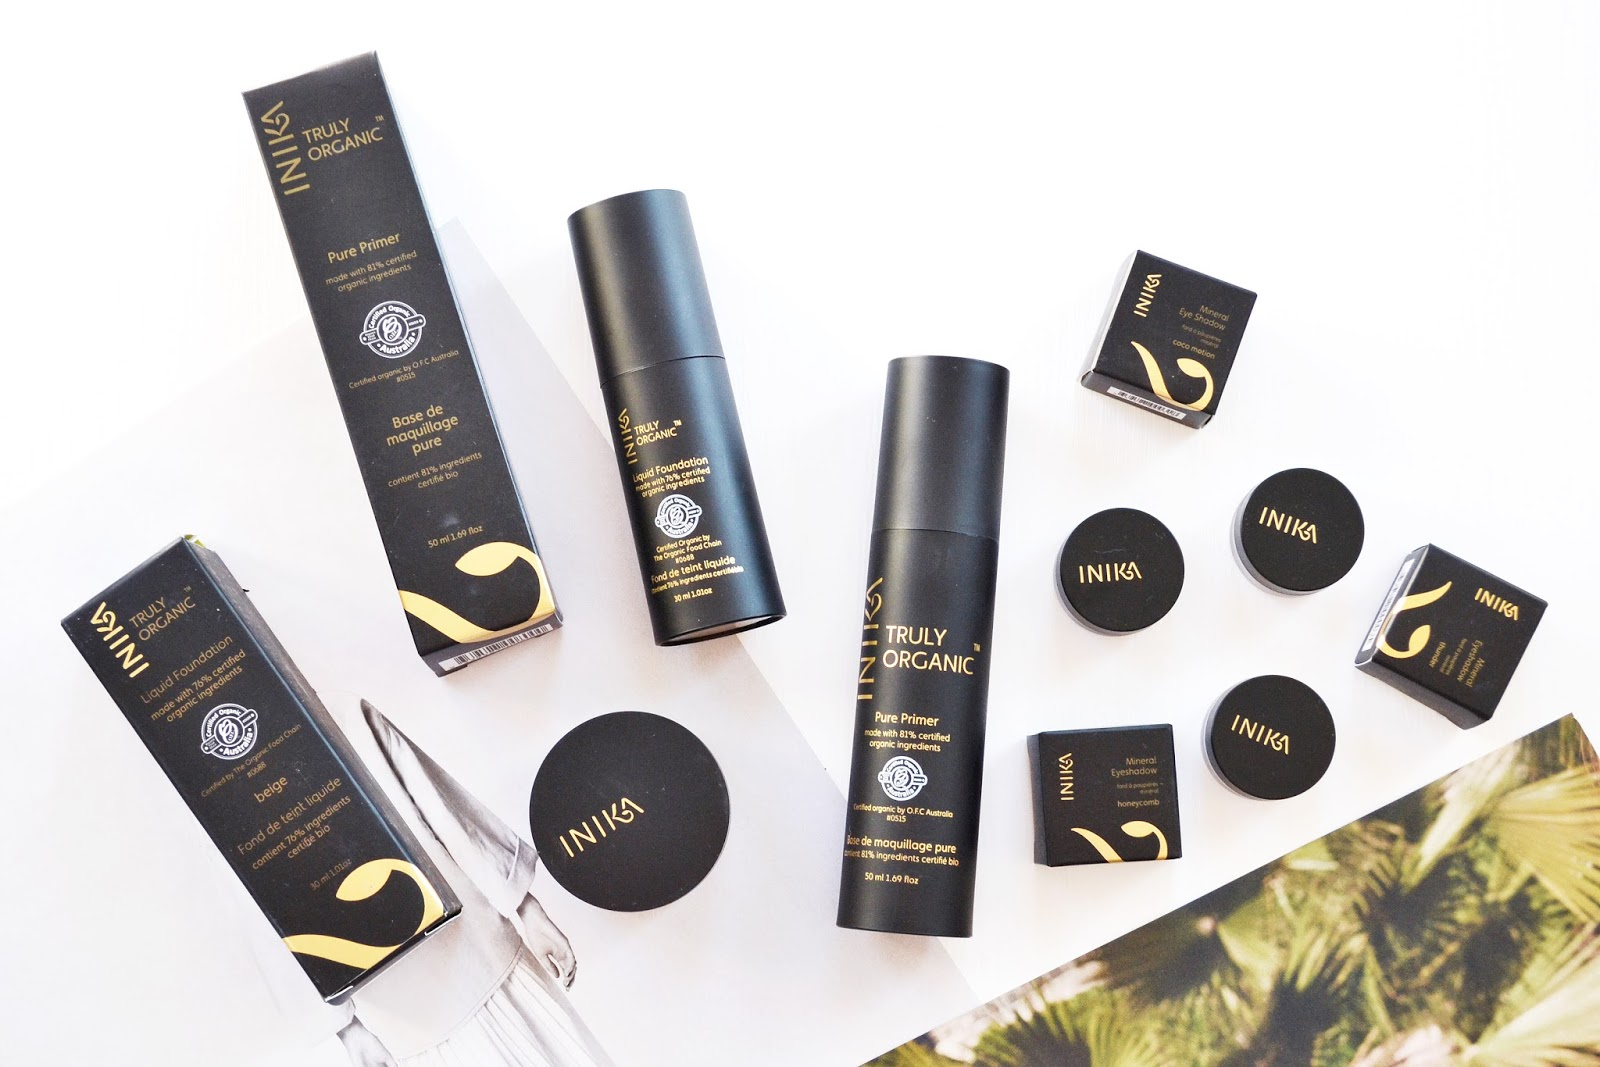 mineral makeup, organic beauty brand, organic make up, inika cosmetics